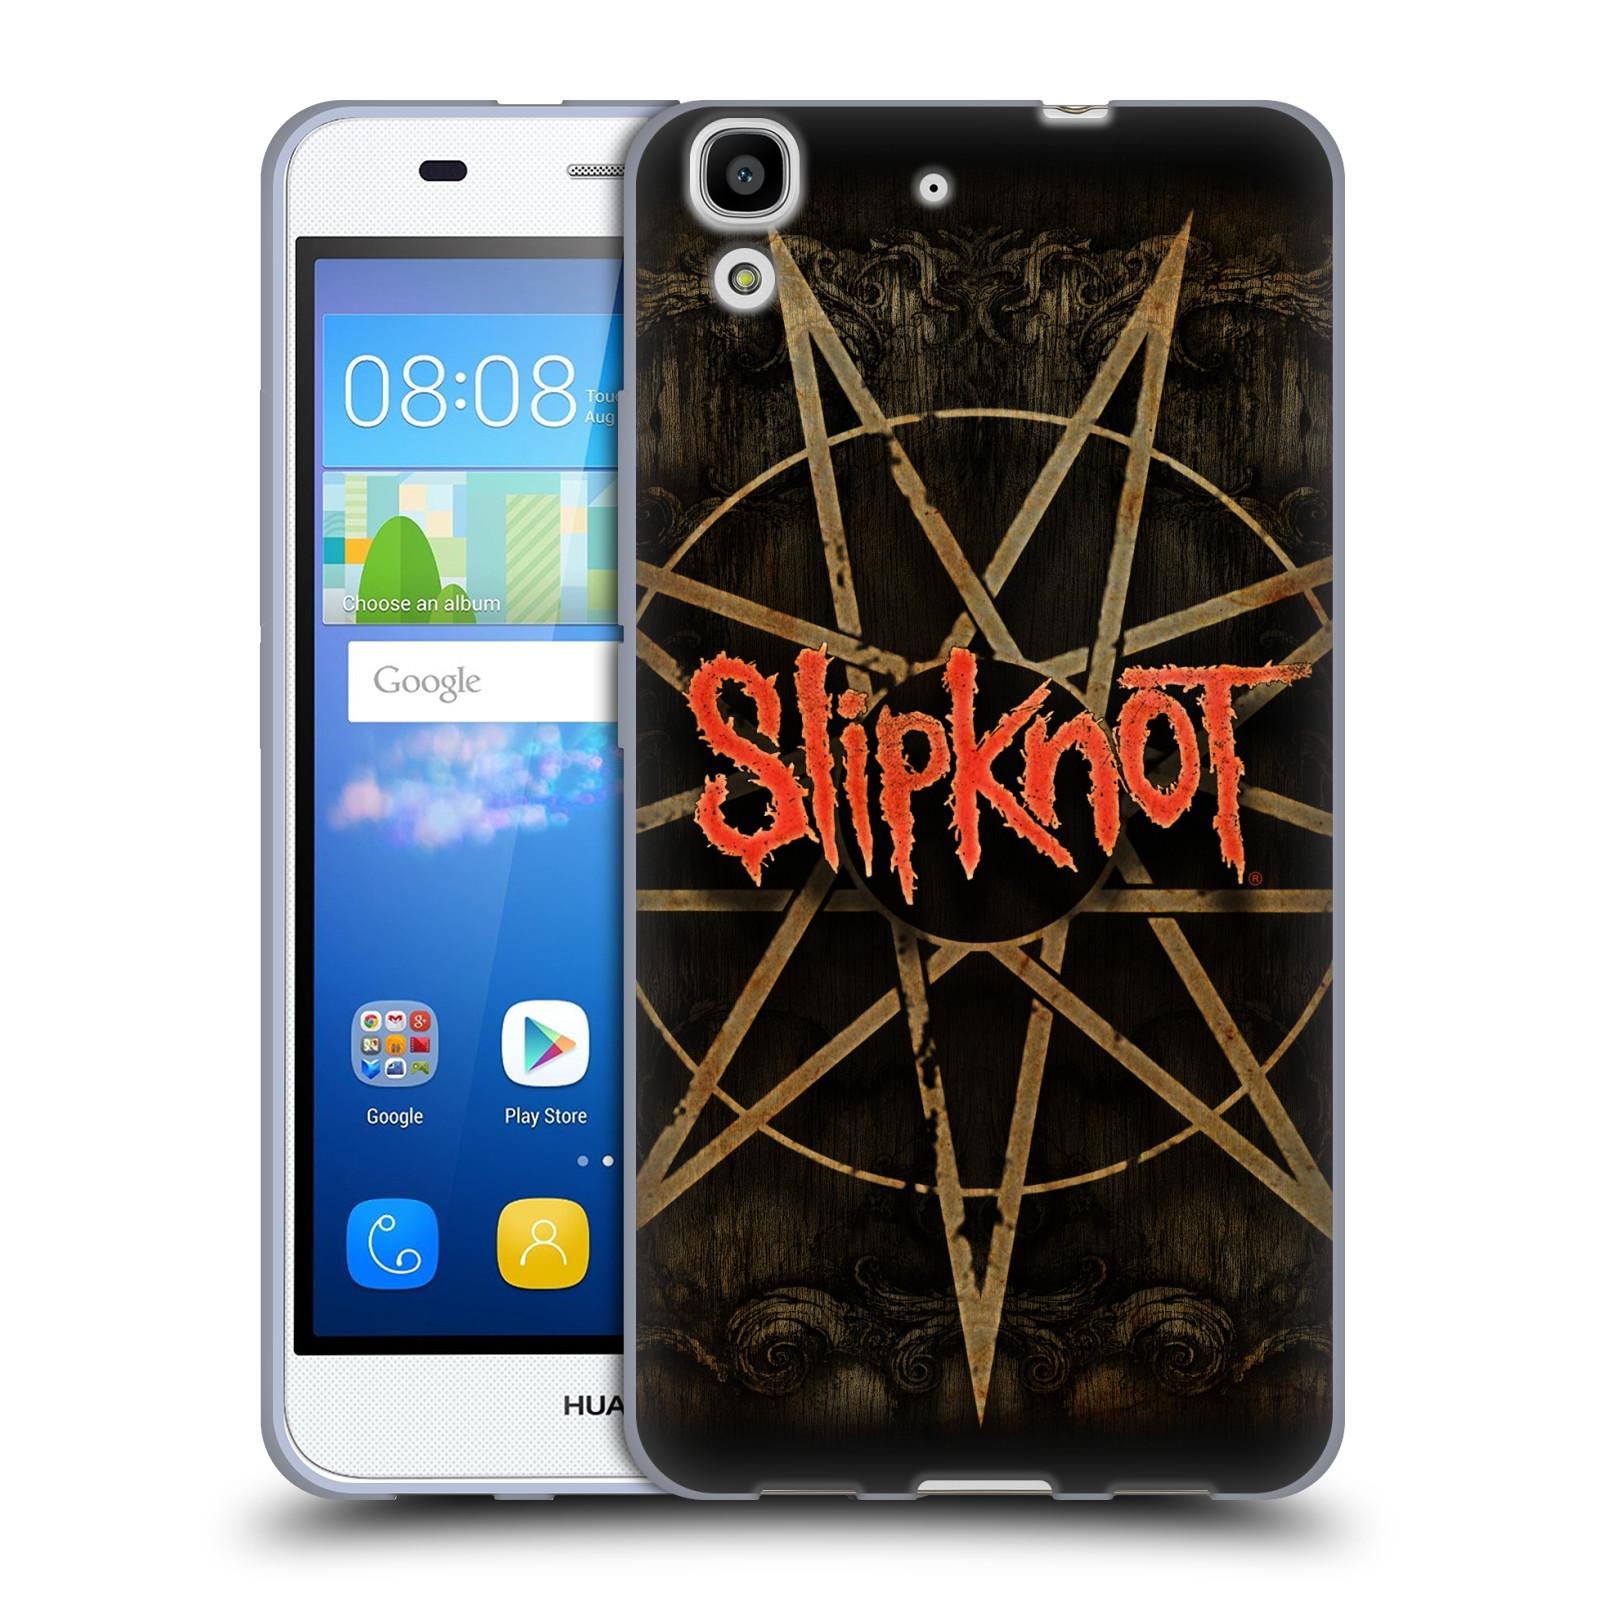 Silikonové pouzdro na mobil Huawei Y6 HEAD CASE Slipknot - Znak